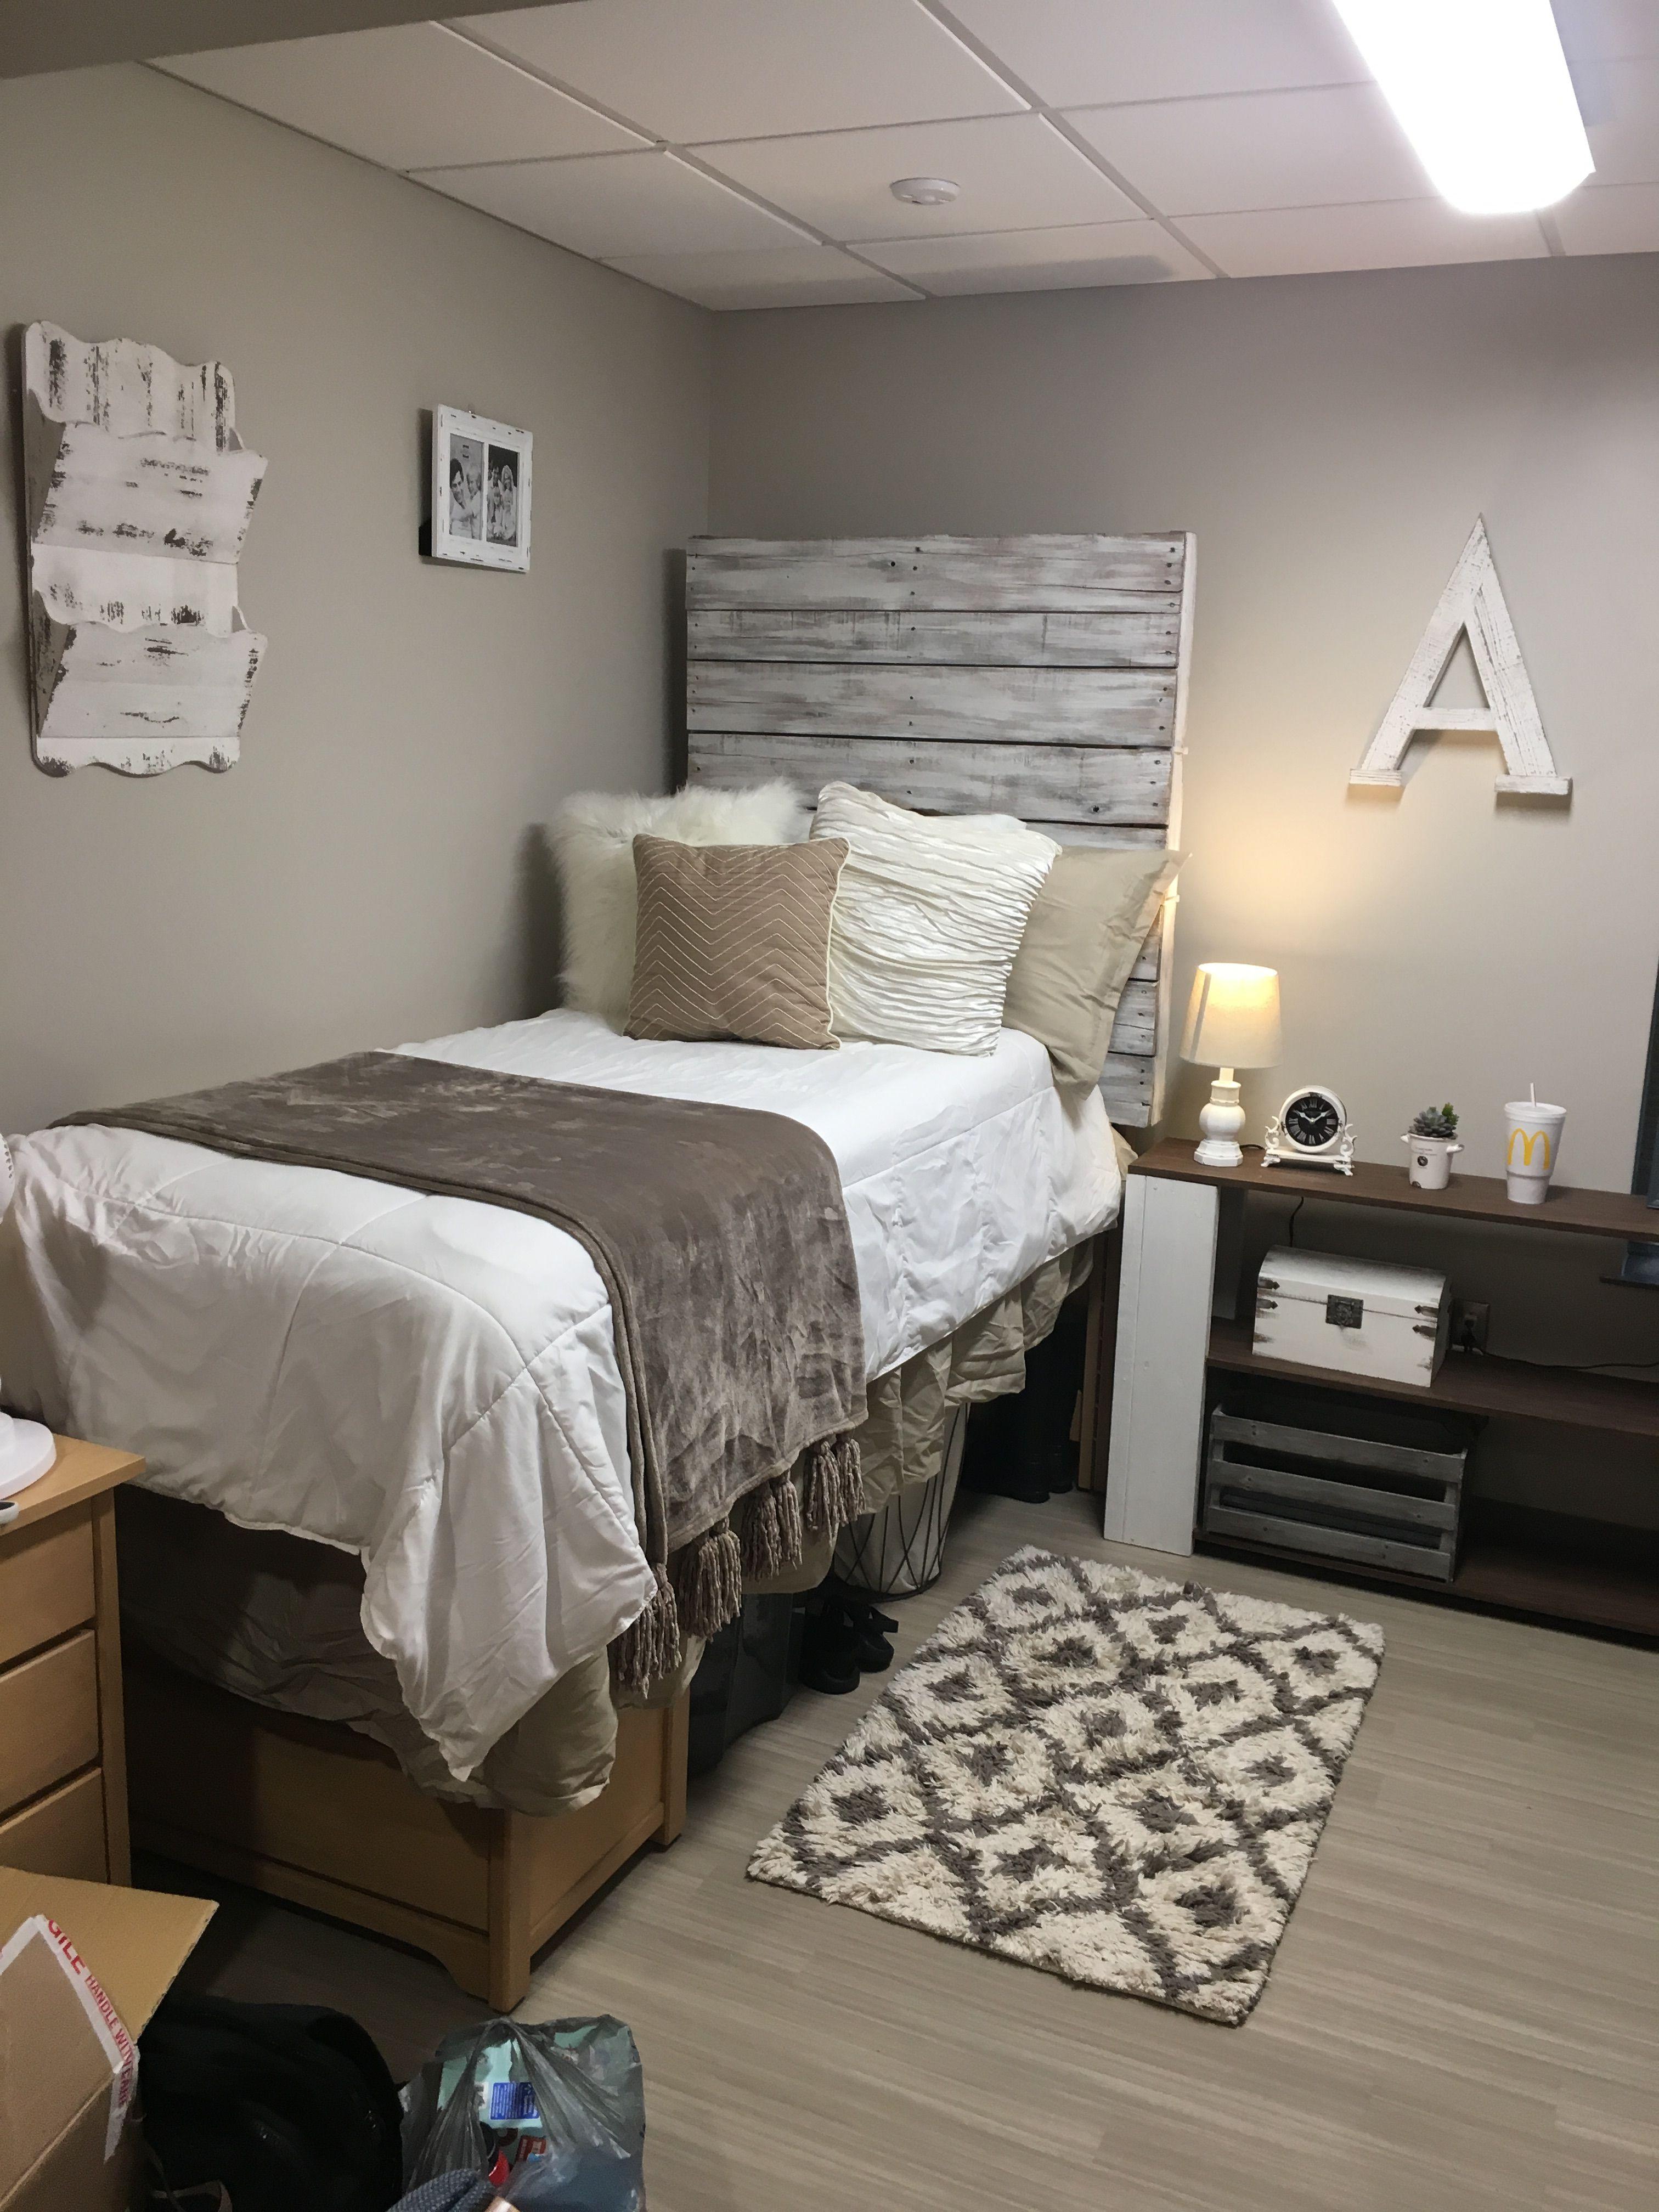 Farmhouse style dorm room  Home is where the heart is